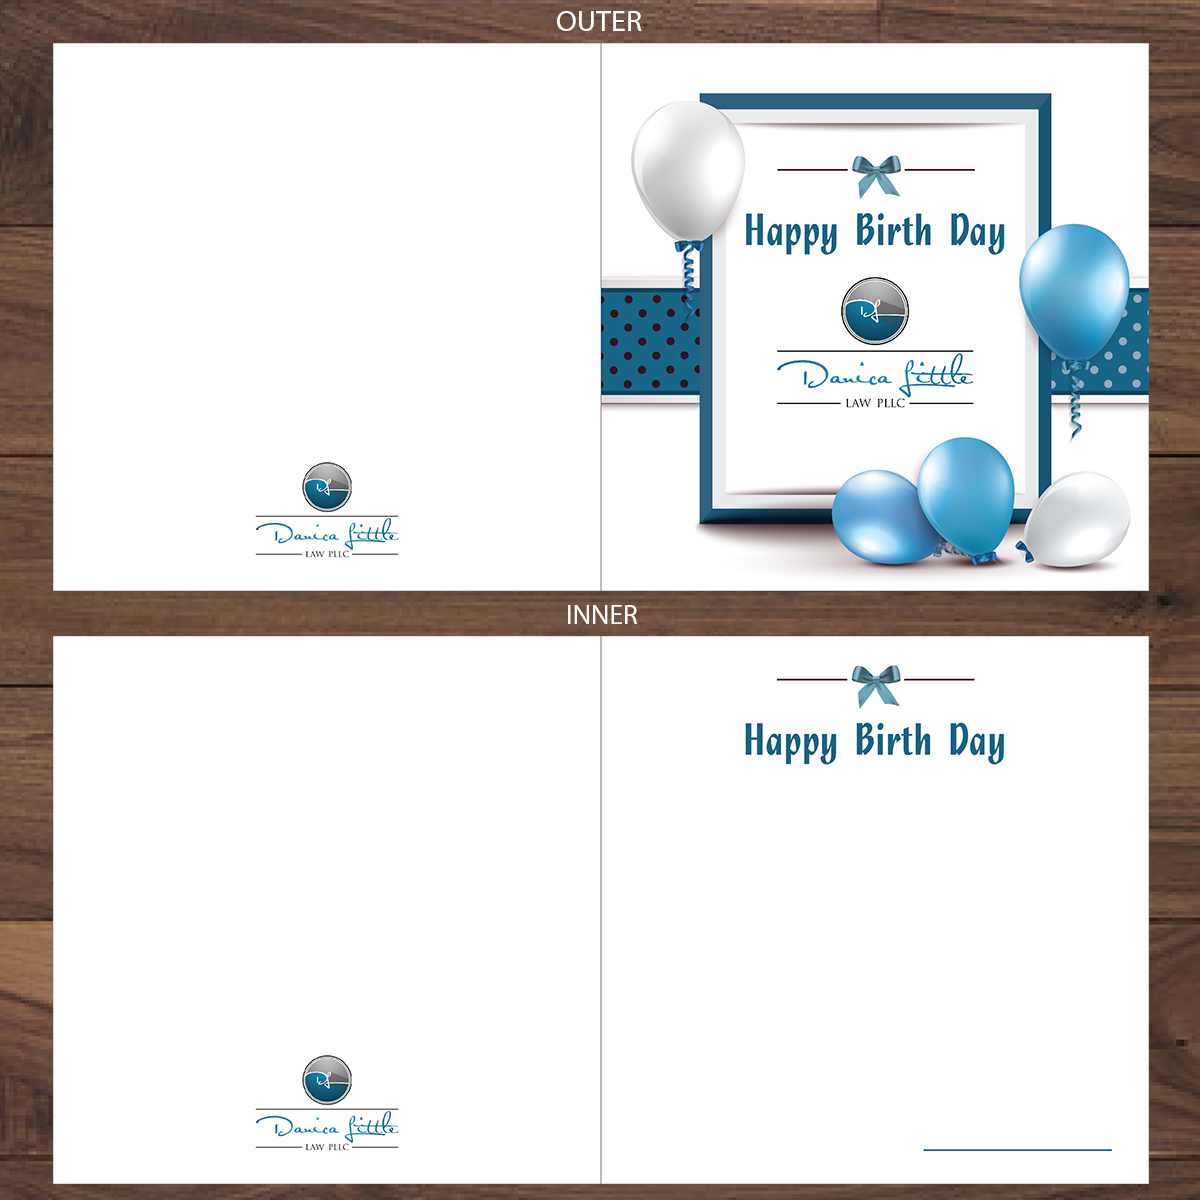 Colorful elegant greeting card design for danica little law pllc colorful elegant greeting card design for company in united states design 13096412 m4hsunfo